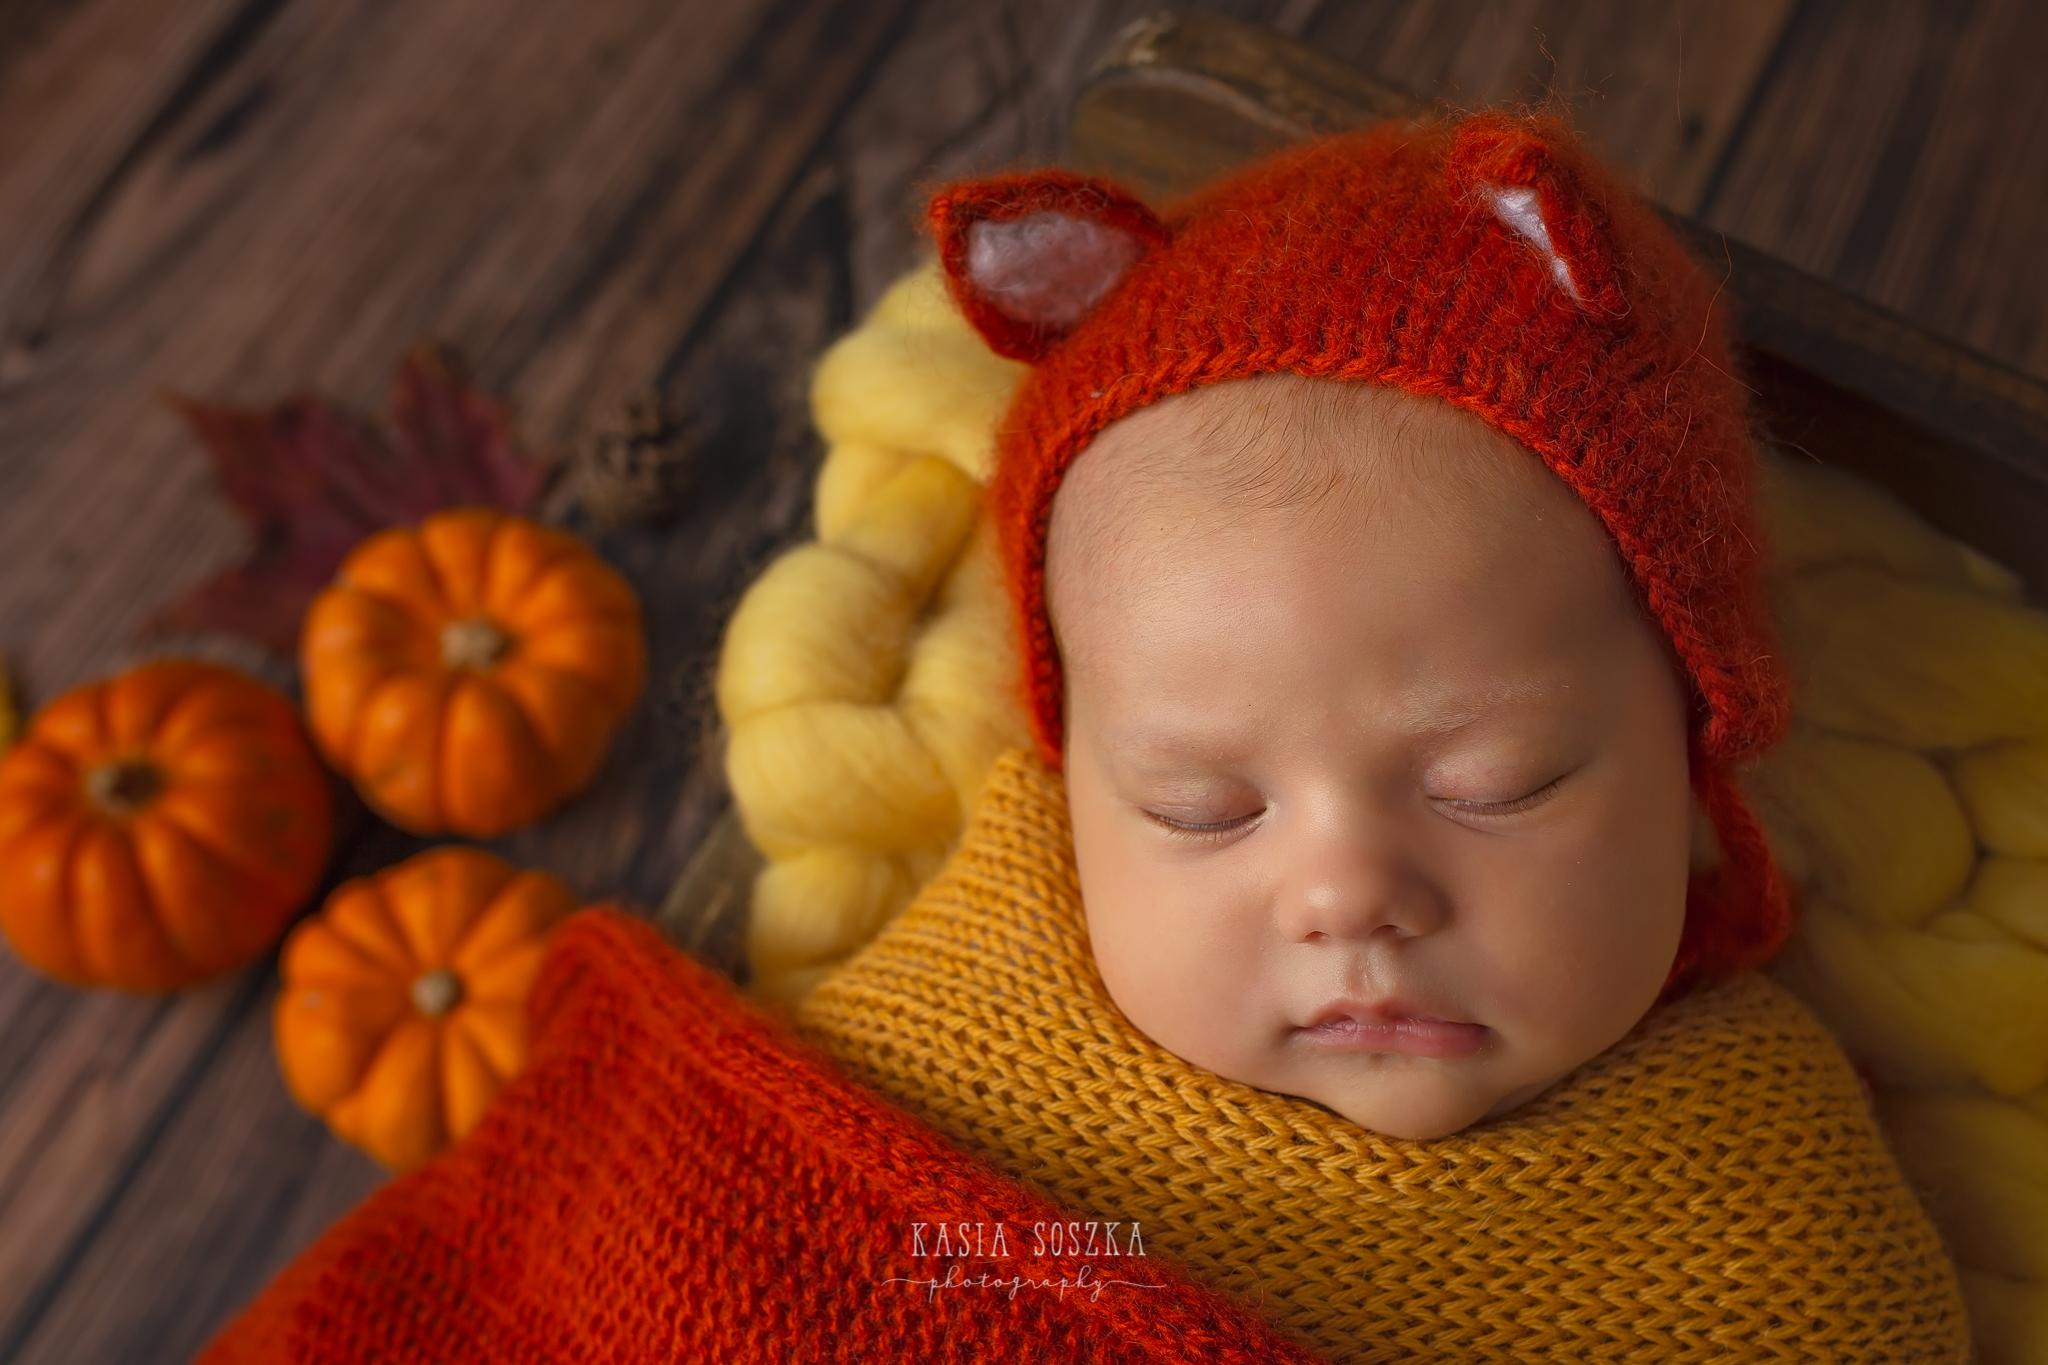 Newborn photography Leeds-York-Bradford-Harrogate: autumn themed newborn session in Leeds, Yorkshire. Cute newborn baby girl in fox outfit